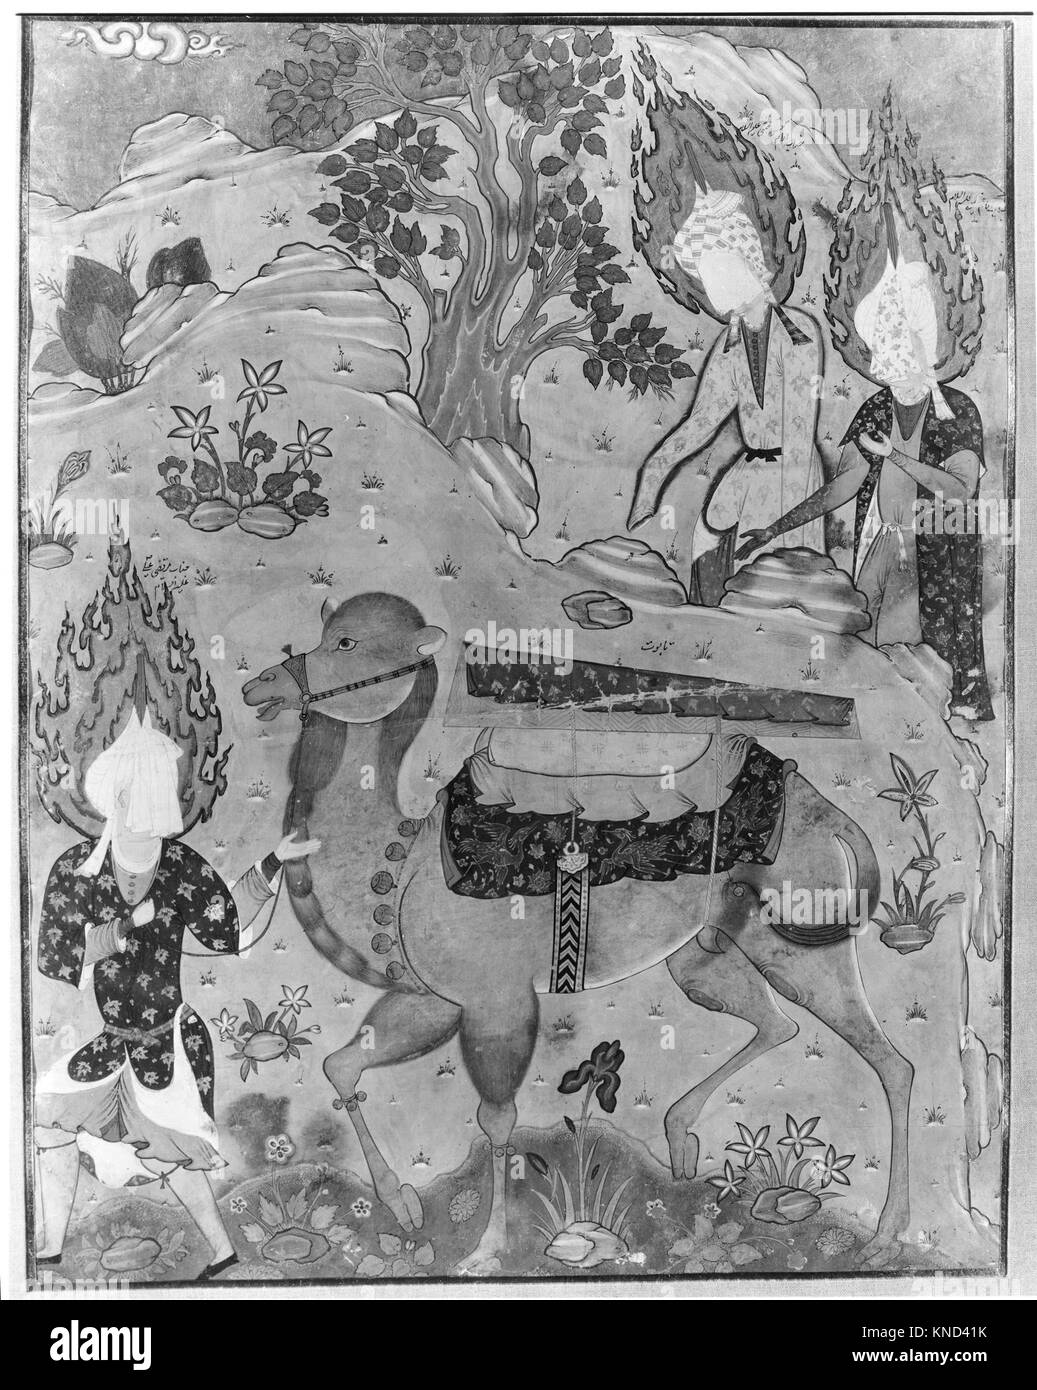 Coffin of Imam 'Ali , Folio from a Falnama (The Book of Omens) of Ja'far al-Sadiq MET 147004 451017 - Stock Image